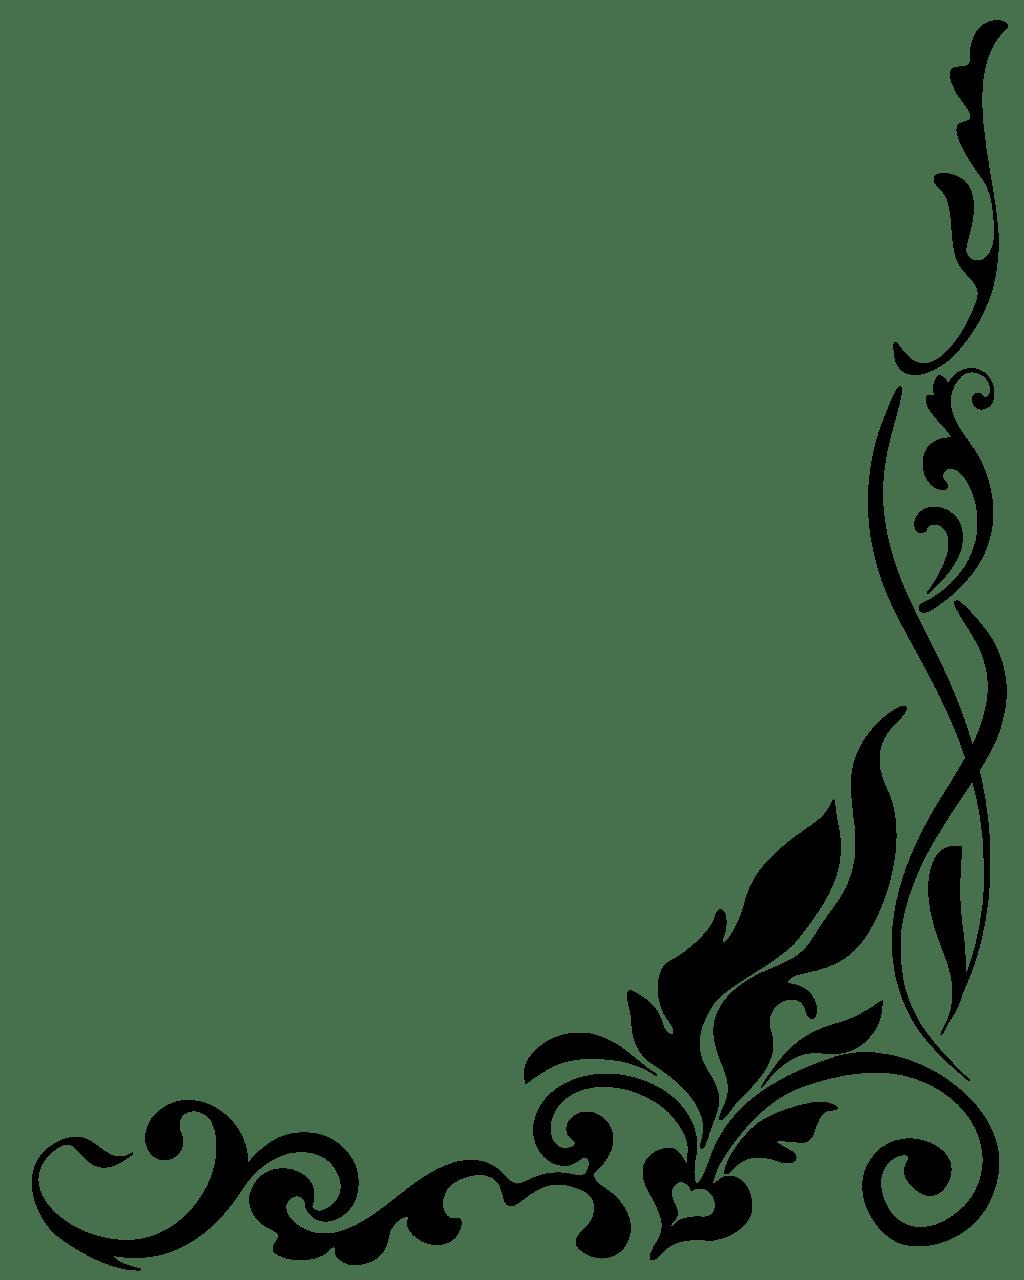 Free Clipart Line Draw Corner